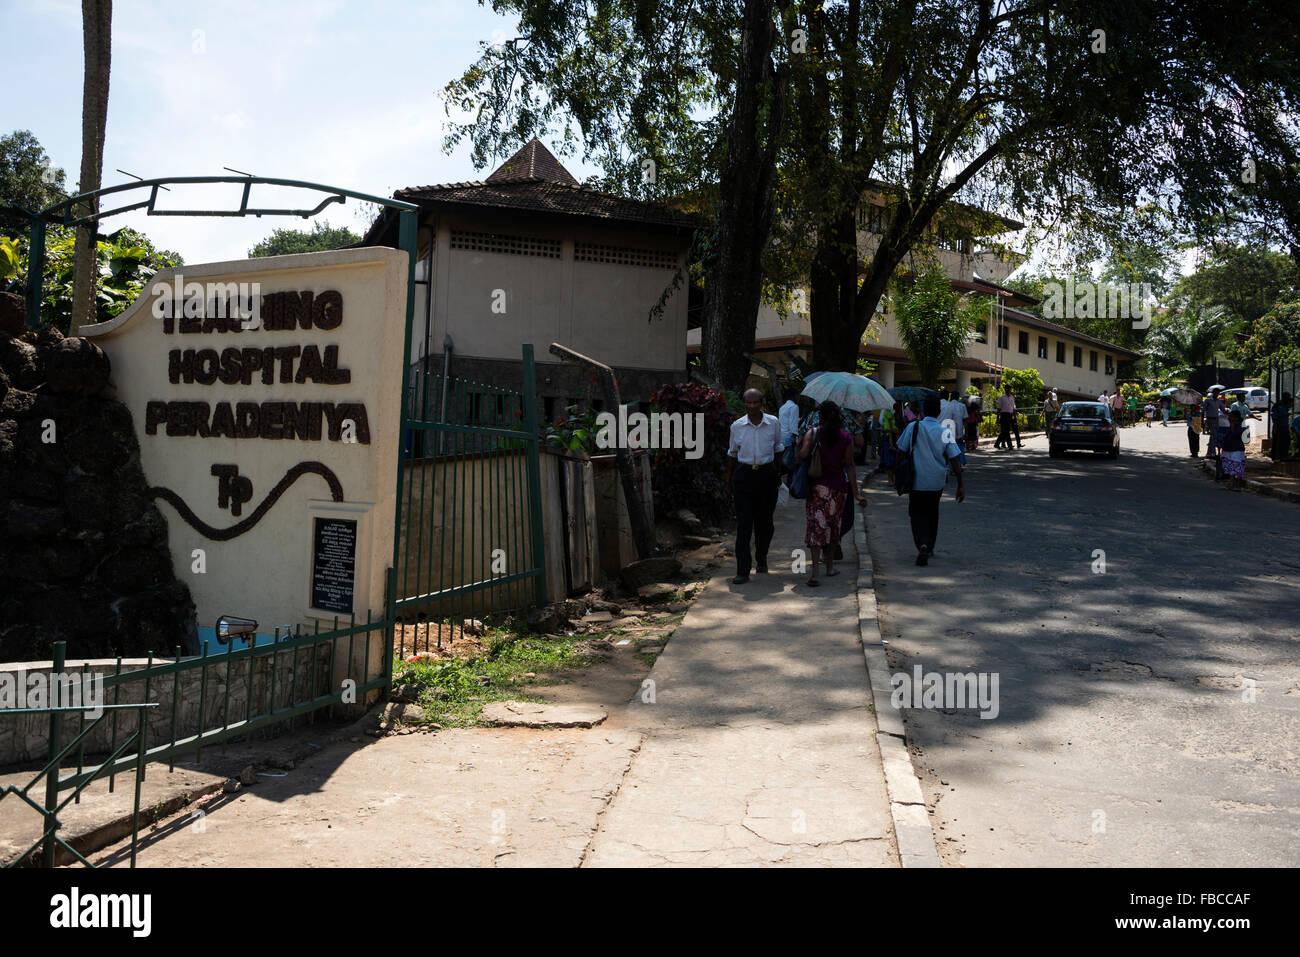 Main entrance to the Teaching Hospital Peradeniya in Kandy, Sri Lanka - Stock Image